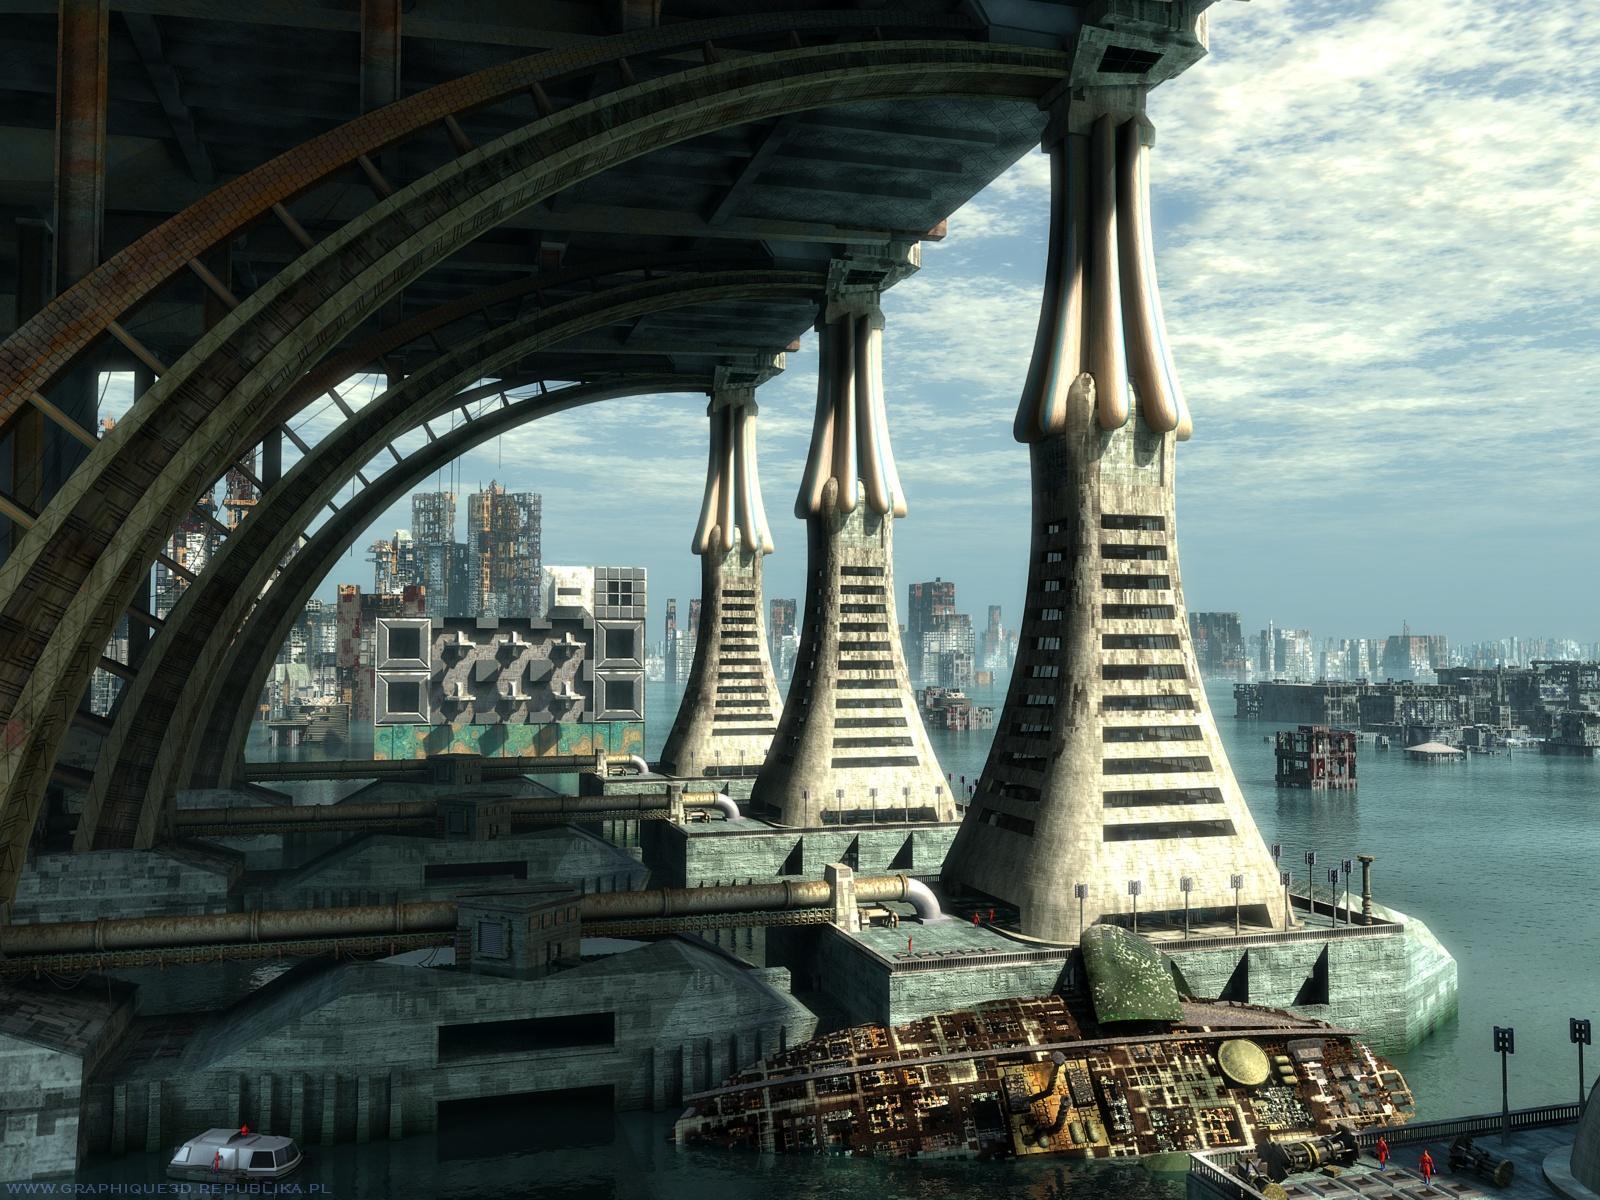 Free Wallpaper Dekstop: Science fiction wallpaper, science fiction wallpapers